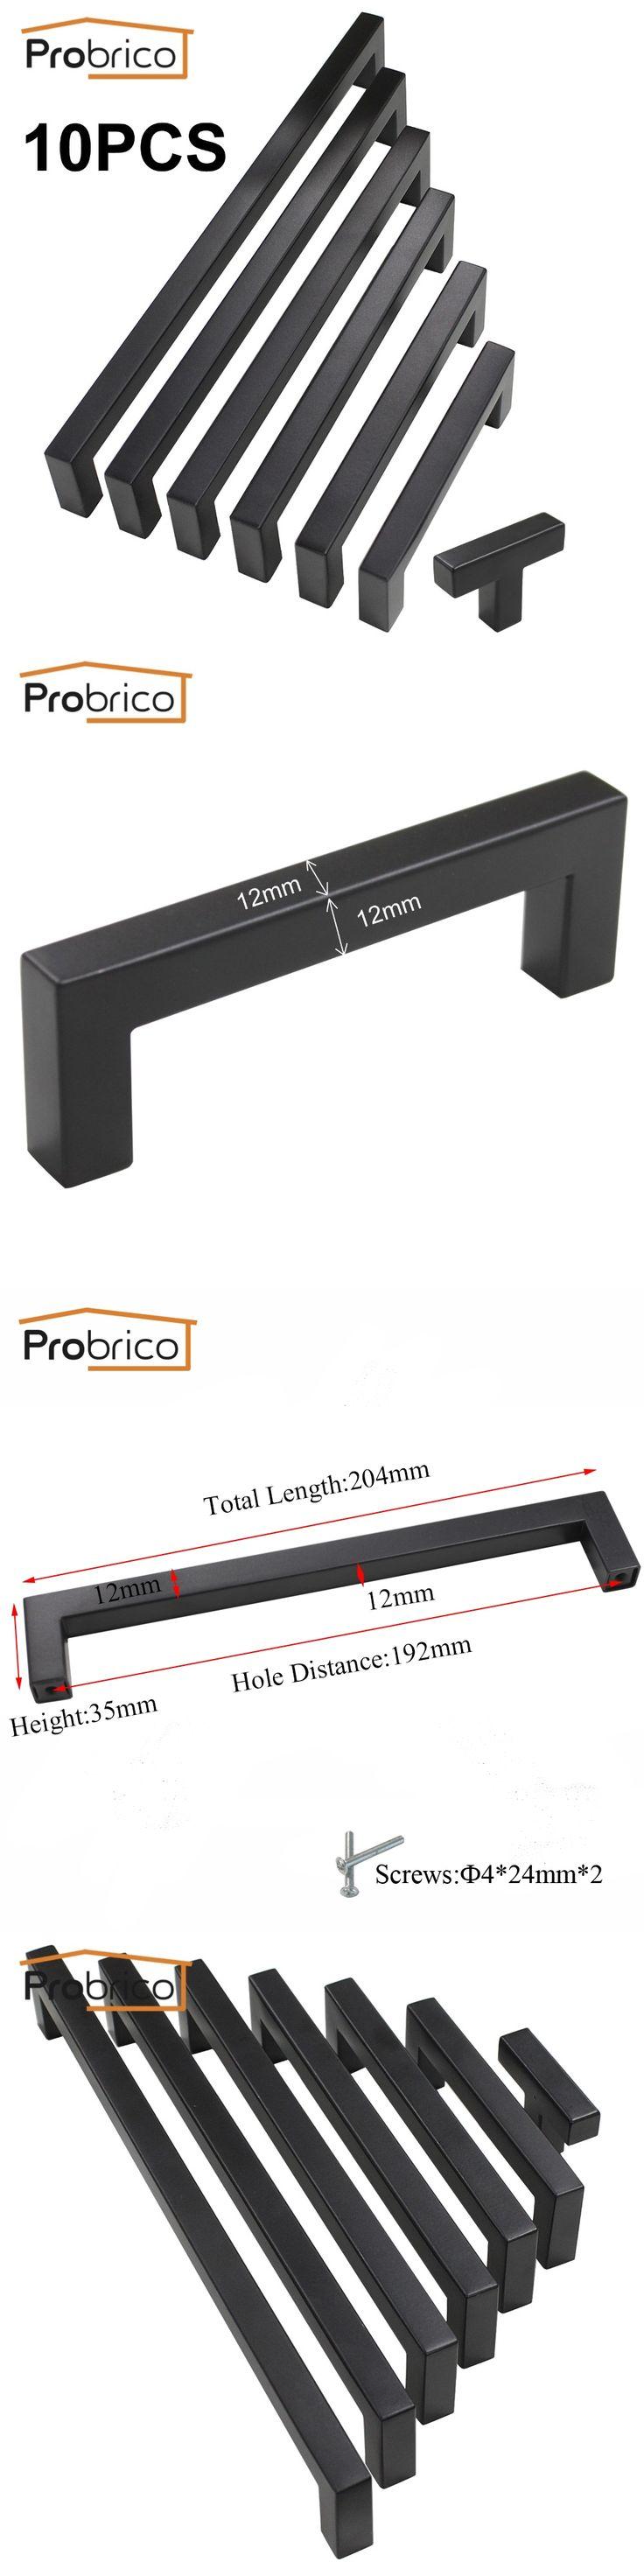 Probrico 10 PCS Black Cabinet Handle 12mm*12mm Square Bar Stainless Steel Kitchen Door Knob Furniture Drawer Pull PDDJS12HBK